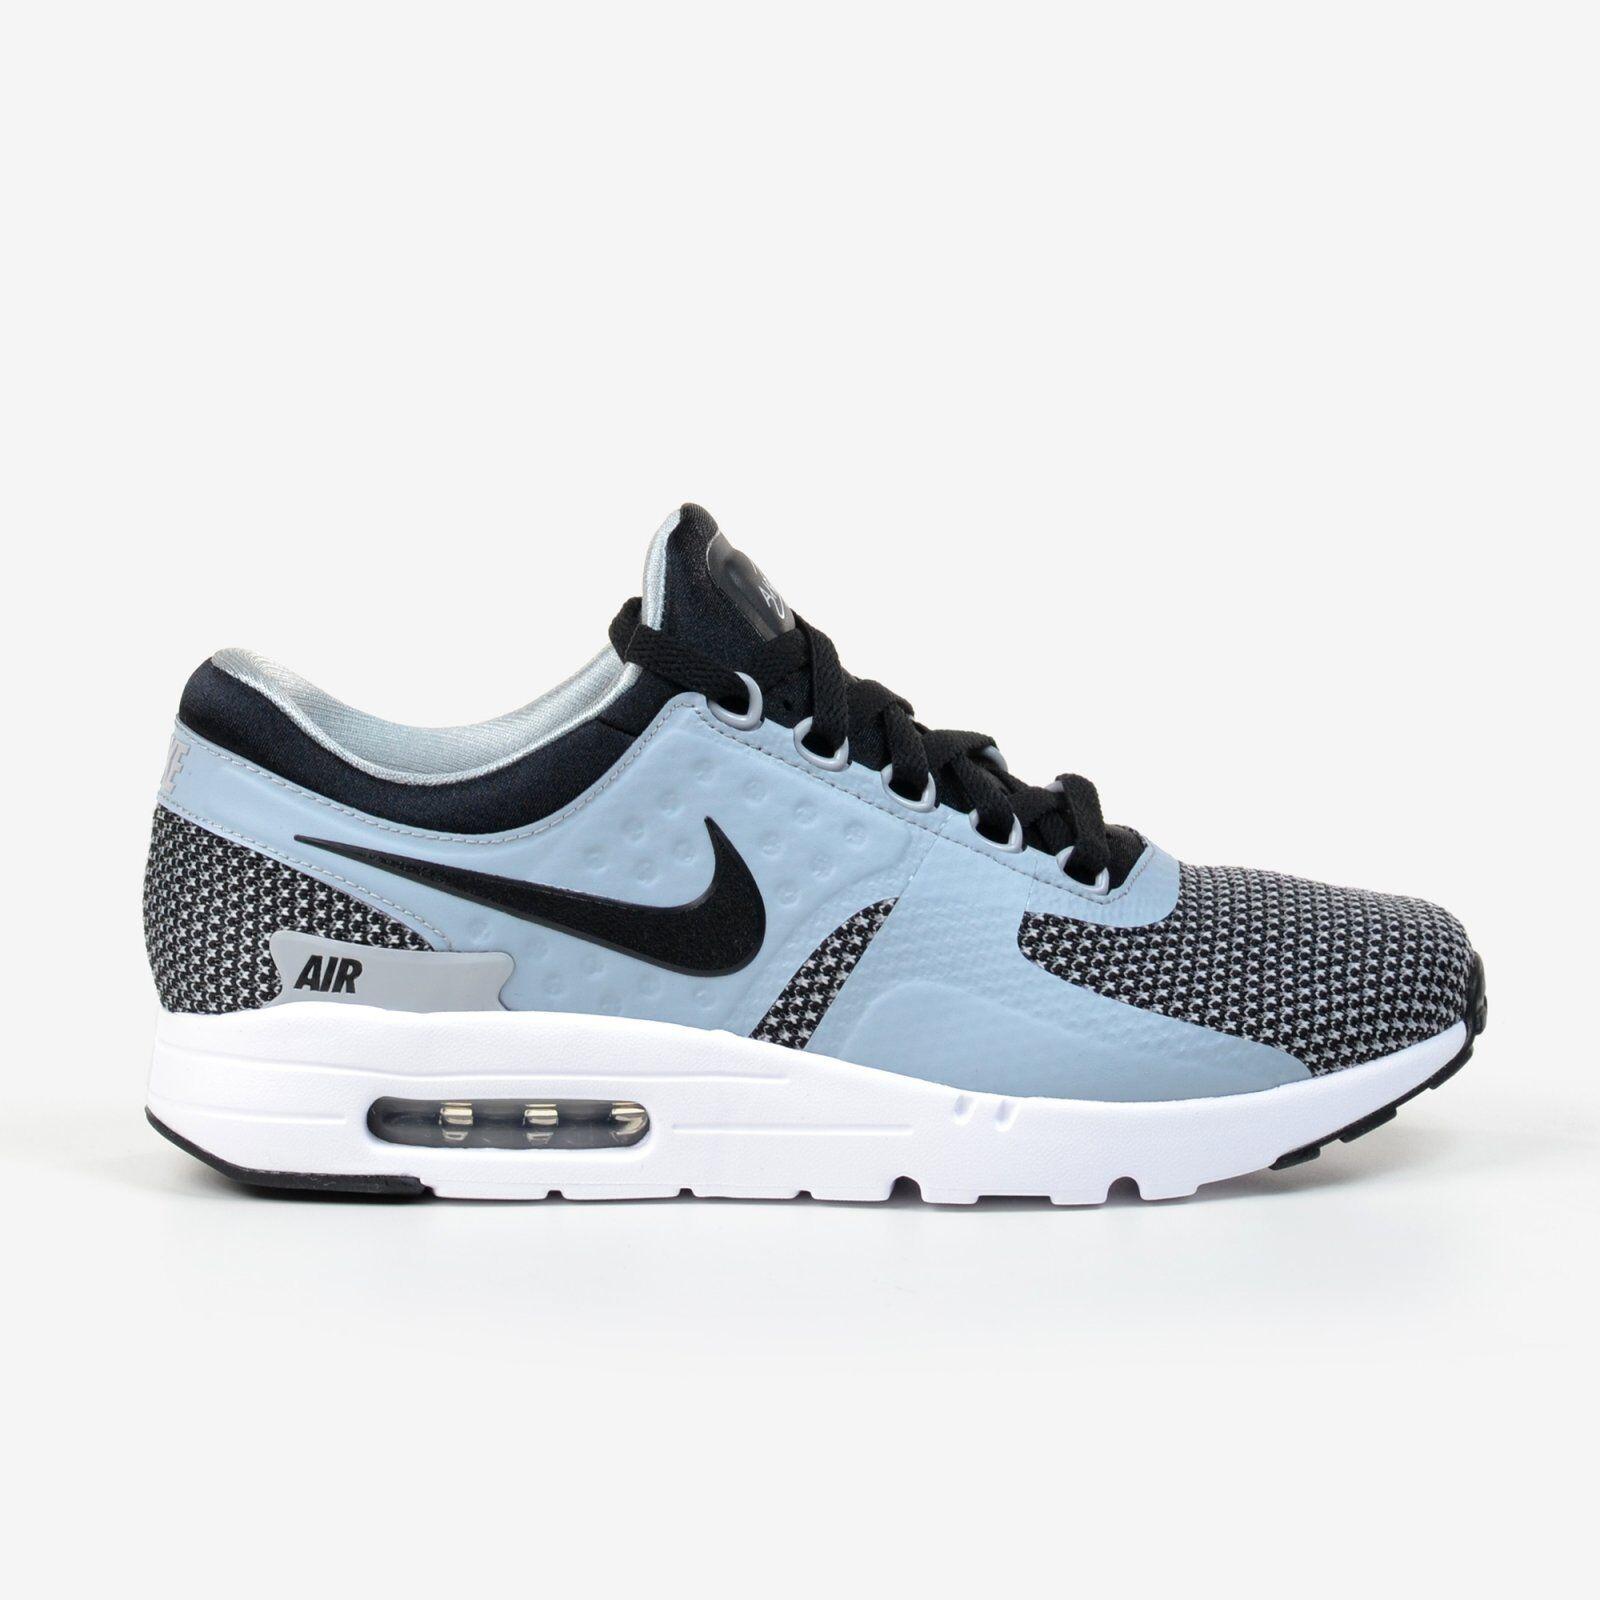 Nike Air Max Zero Essential noir Wolf  Gris  2018 homme fonctionnement chaussures 876070-002